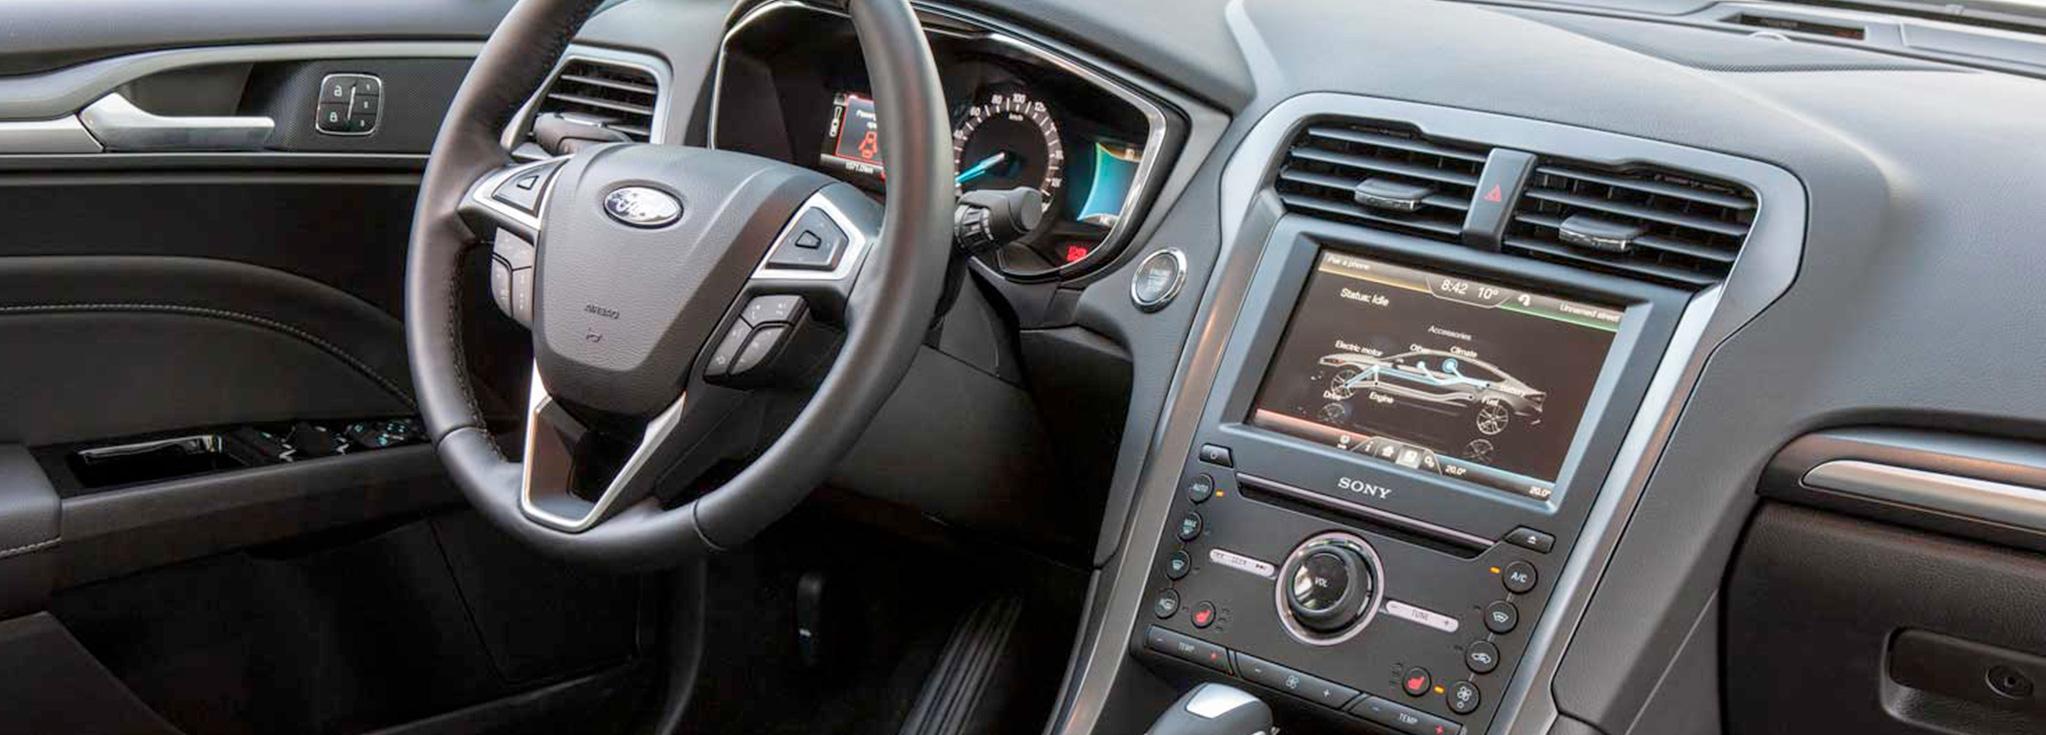 consola del Ford Mondeo Híbrido